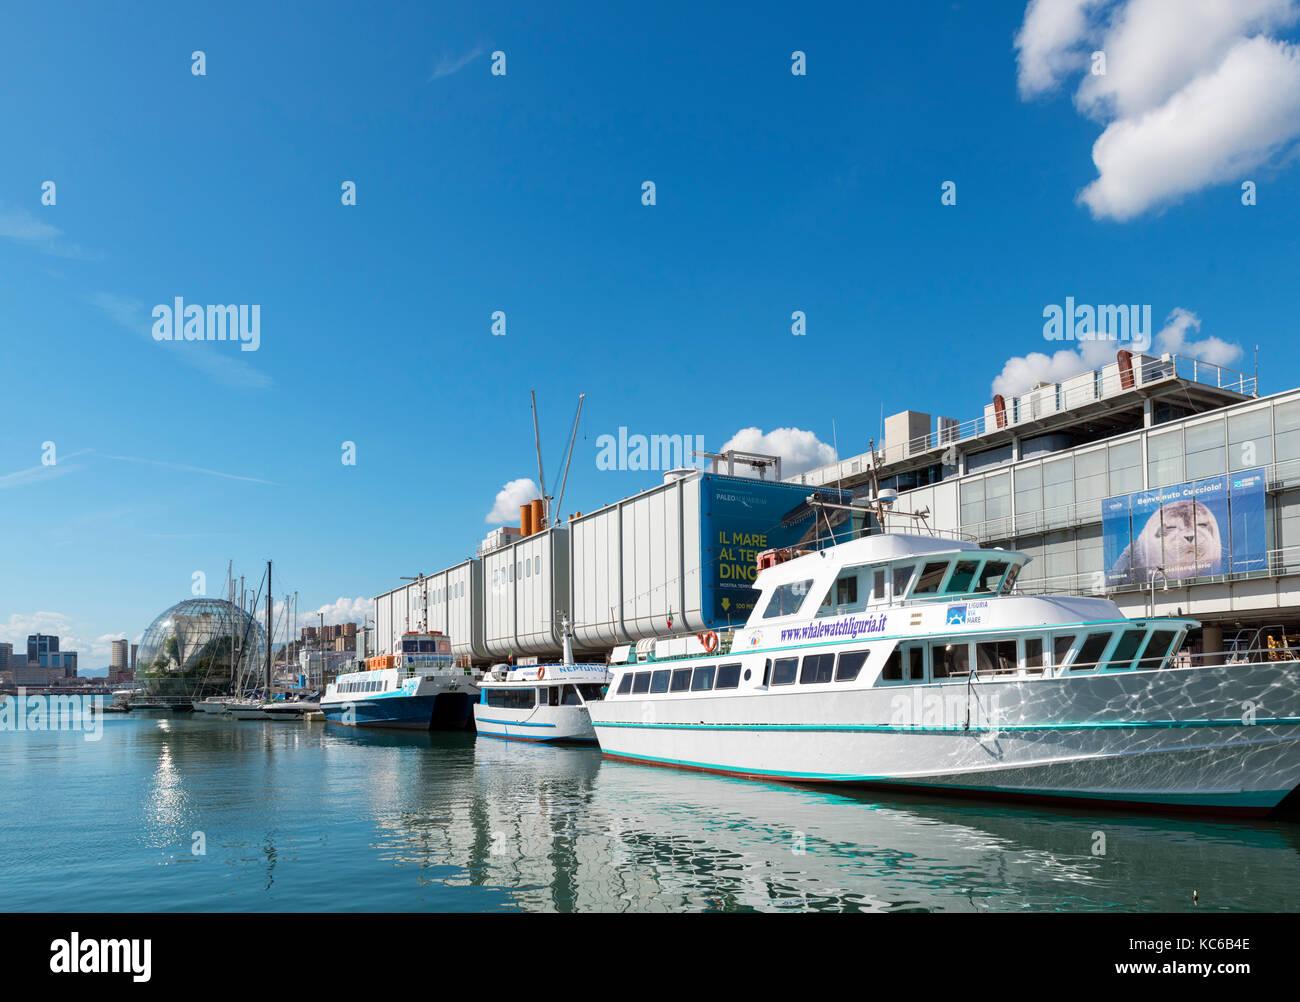 The Aquarium of Genoa, Old Port, Genoa, Liguria, Italy - Stock Image